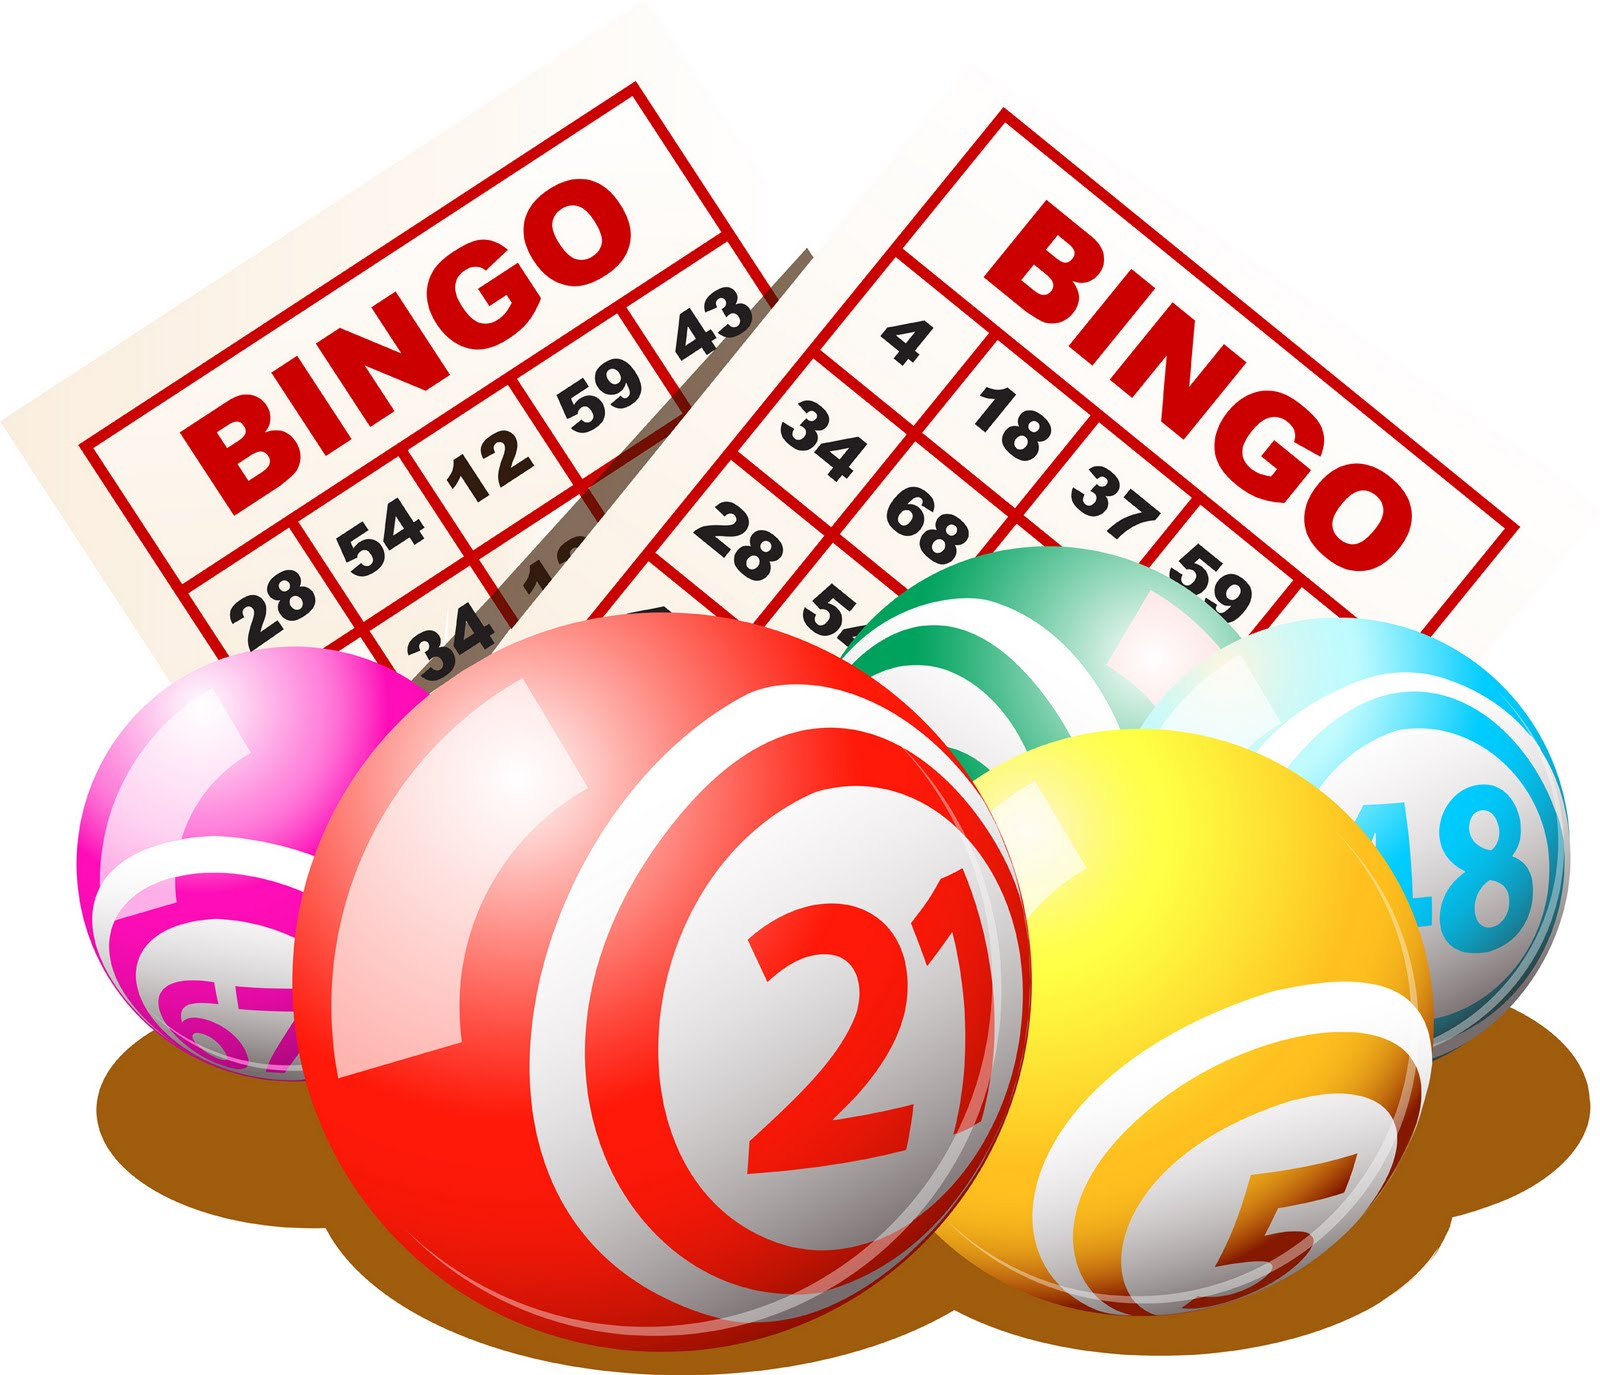 Juegos 7Bitcasino com tipos de bonos-157079